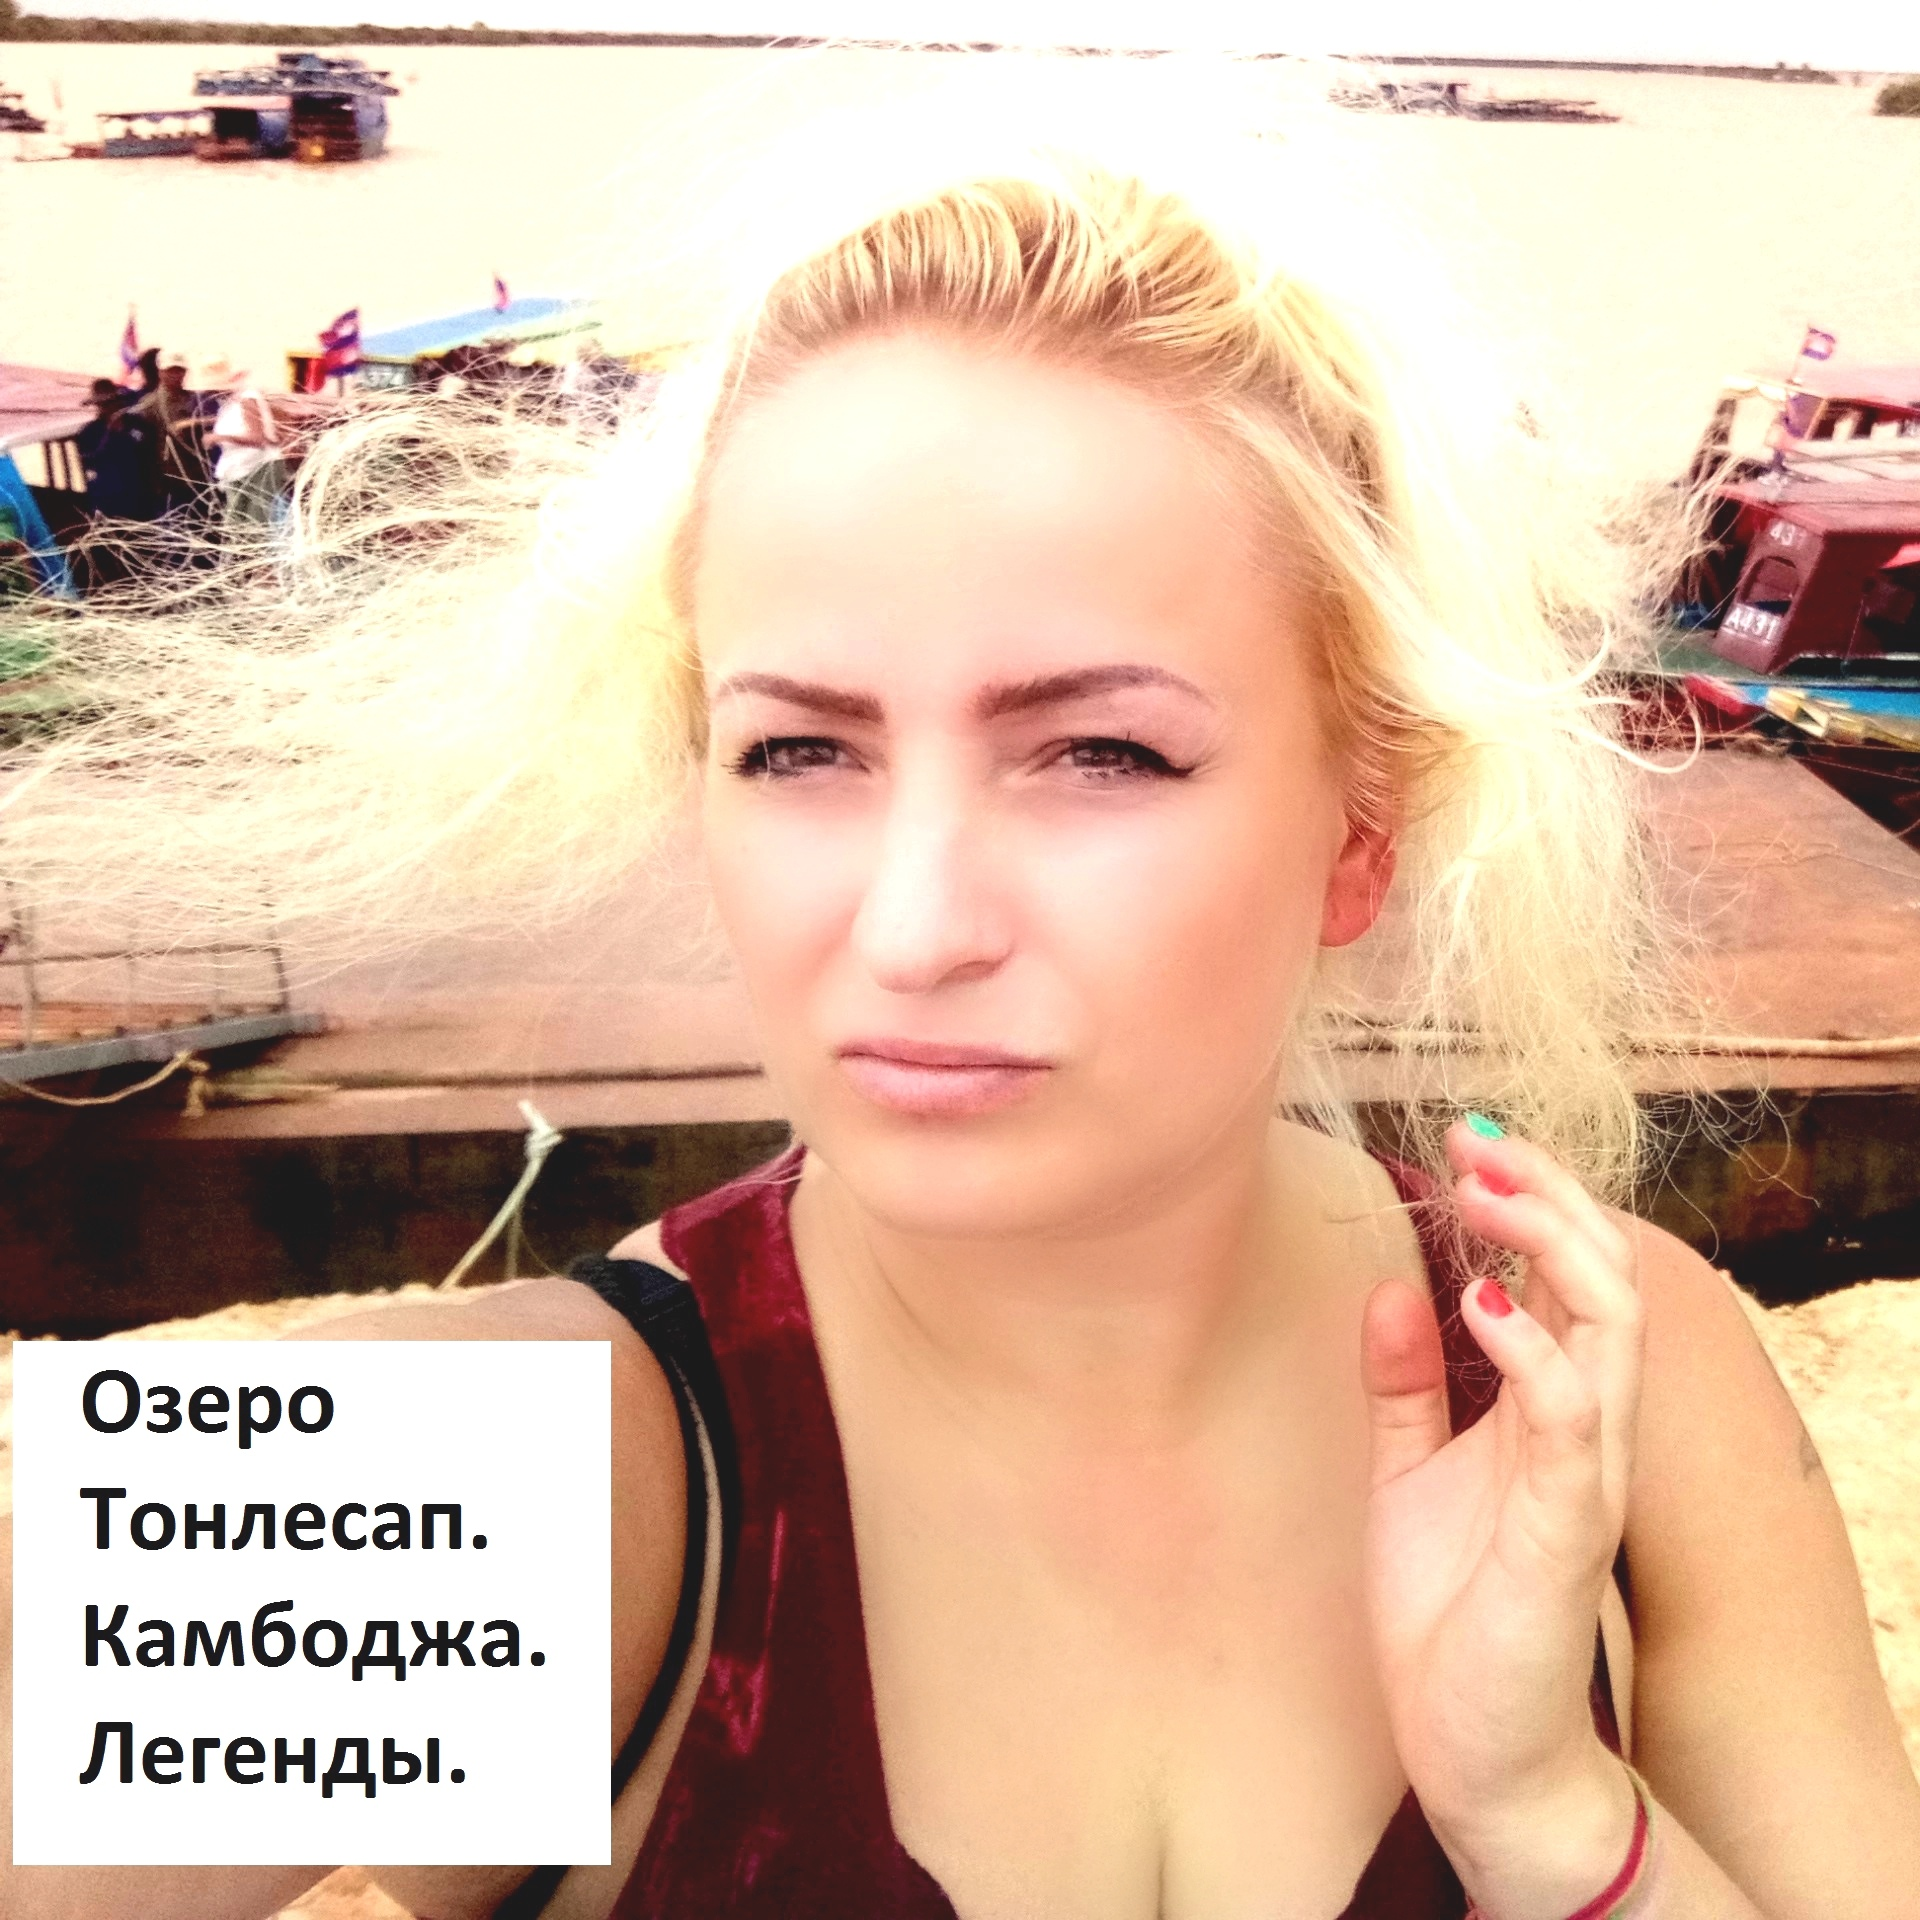 Хештег легенда на   Салон Магии и Мистики Елены Руденко. Киев ,тел: +380506251562 ATqZMIzBKuc